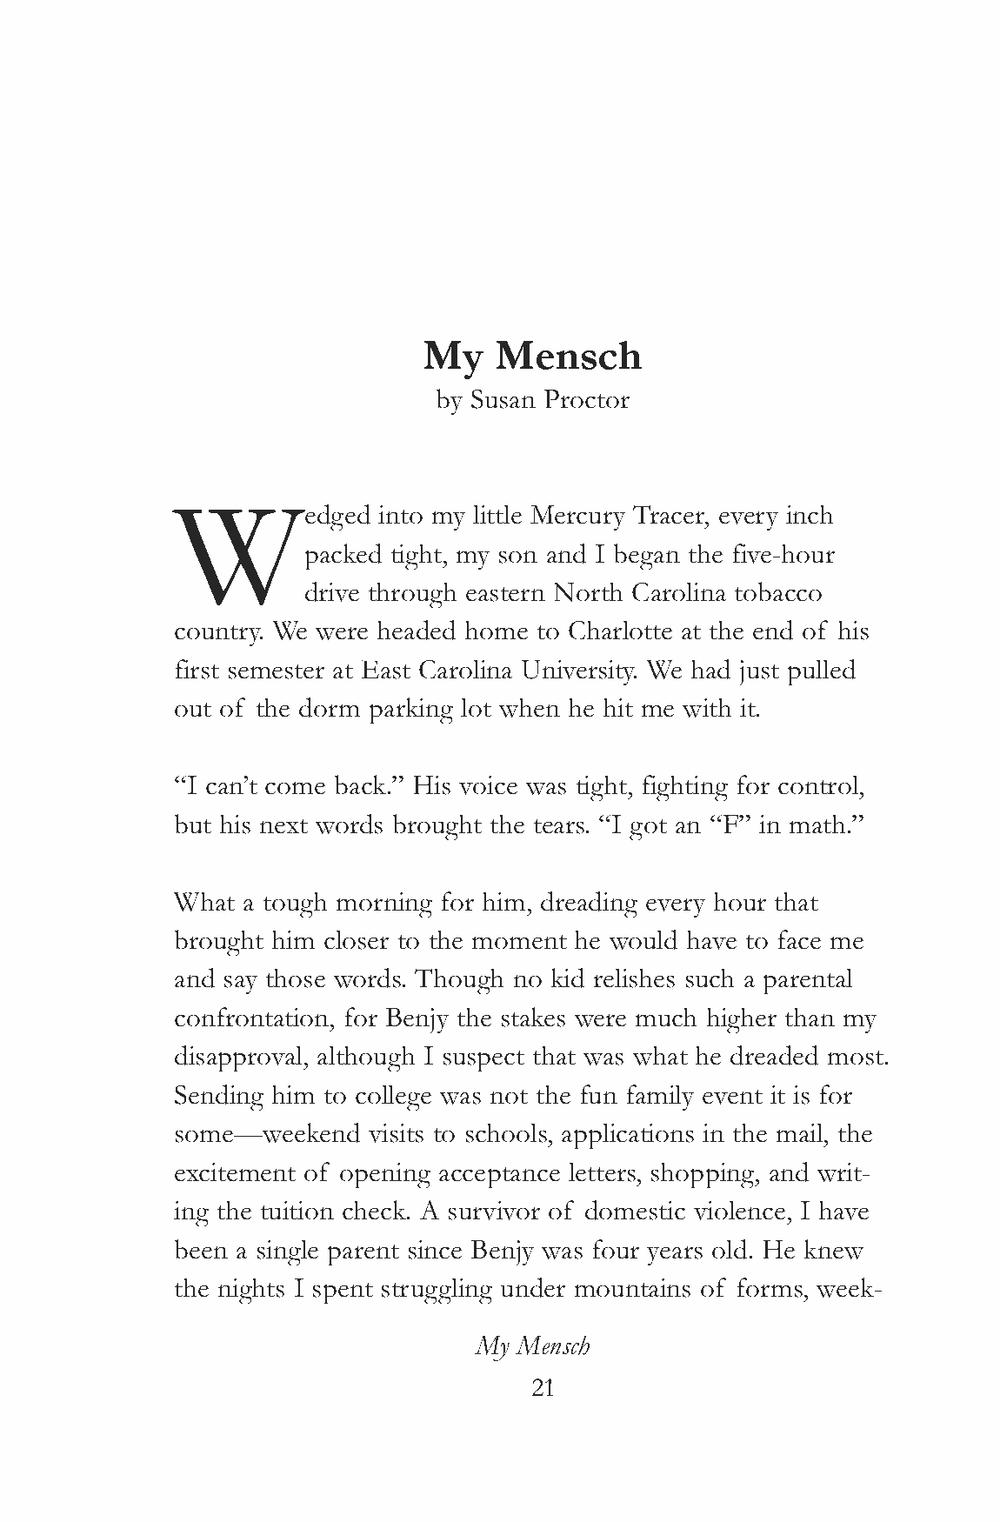 My Mensch - p 21.png